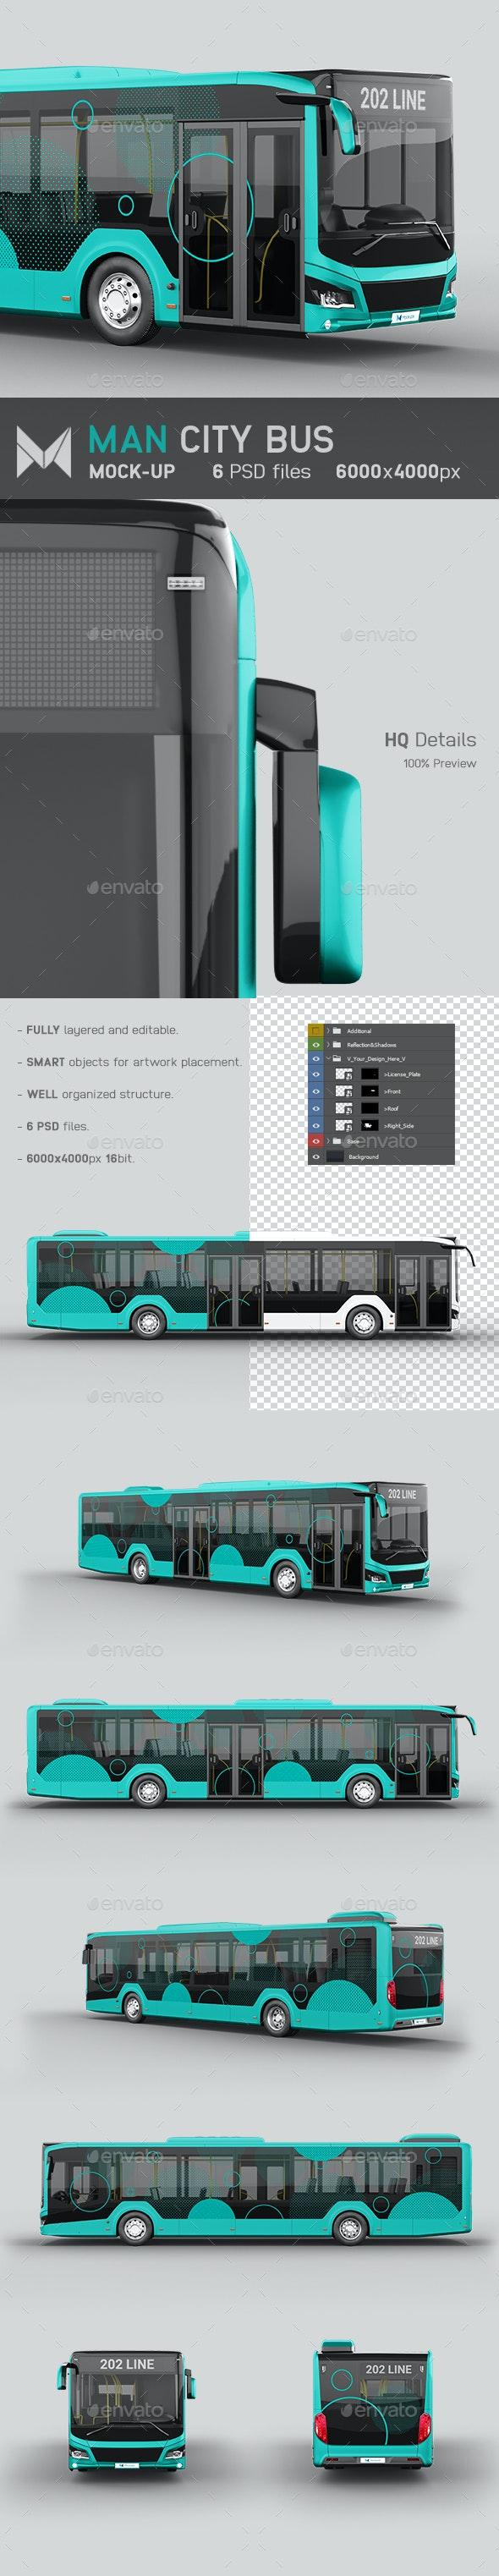 Man City Bus Mockup - Vehicle Wraps Print